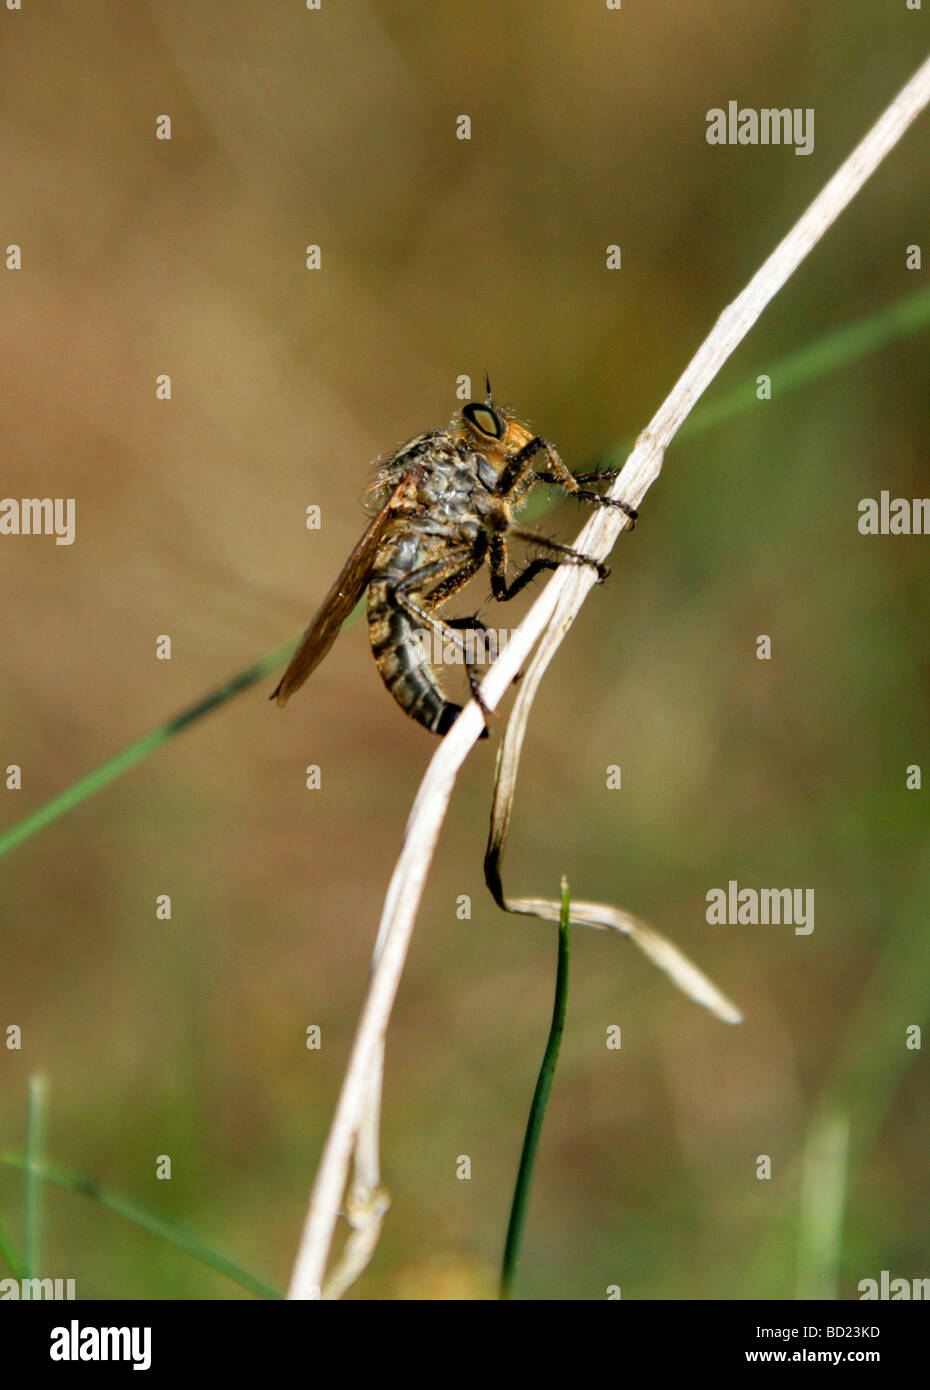 Common Awl Robberfly, Neoitamus cyanurus  Syn. Asilus cyanurus, Asilinae, Asilidae, Diptera - Stock Image